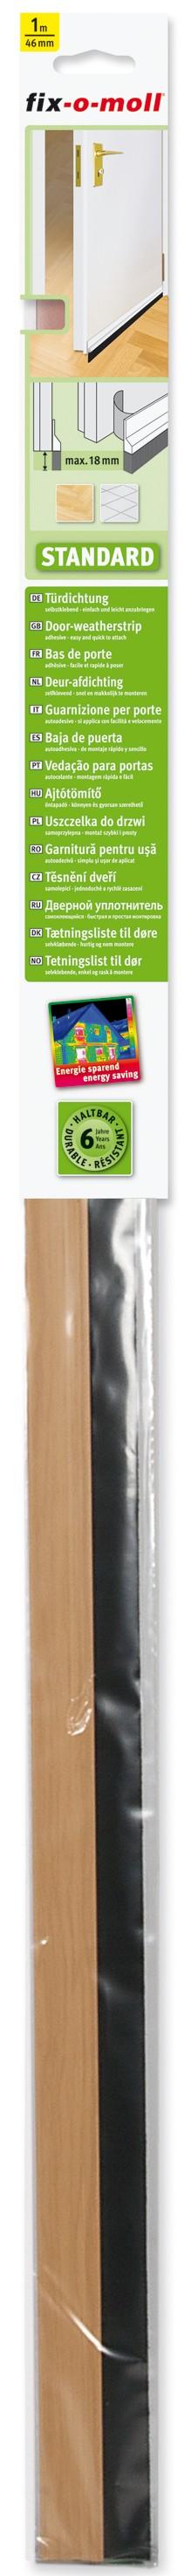 Türdichtung Standard fix-o-moll mit Bürste, Eiche, 1m x 46mm